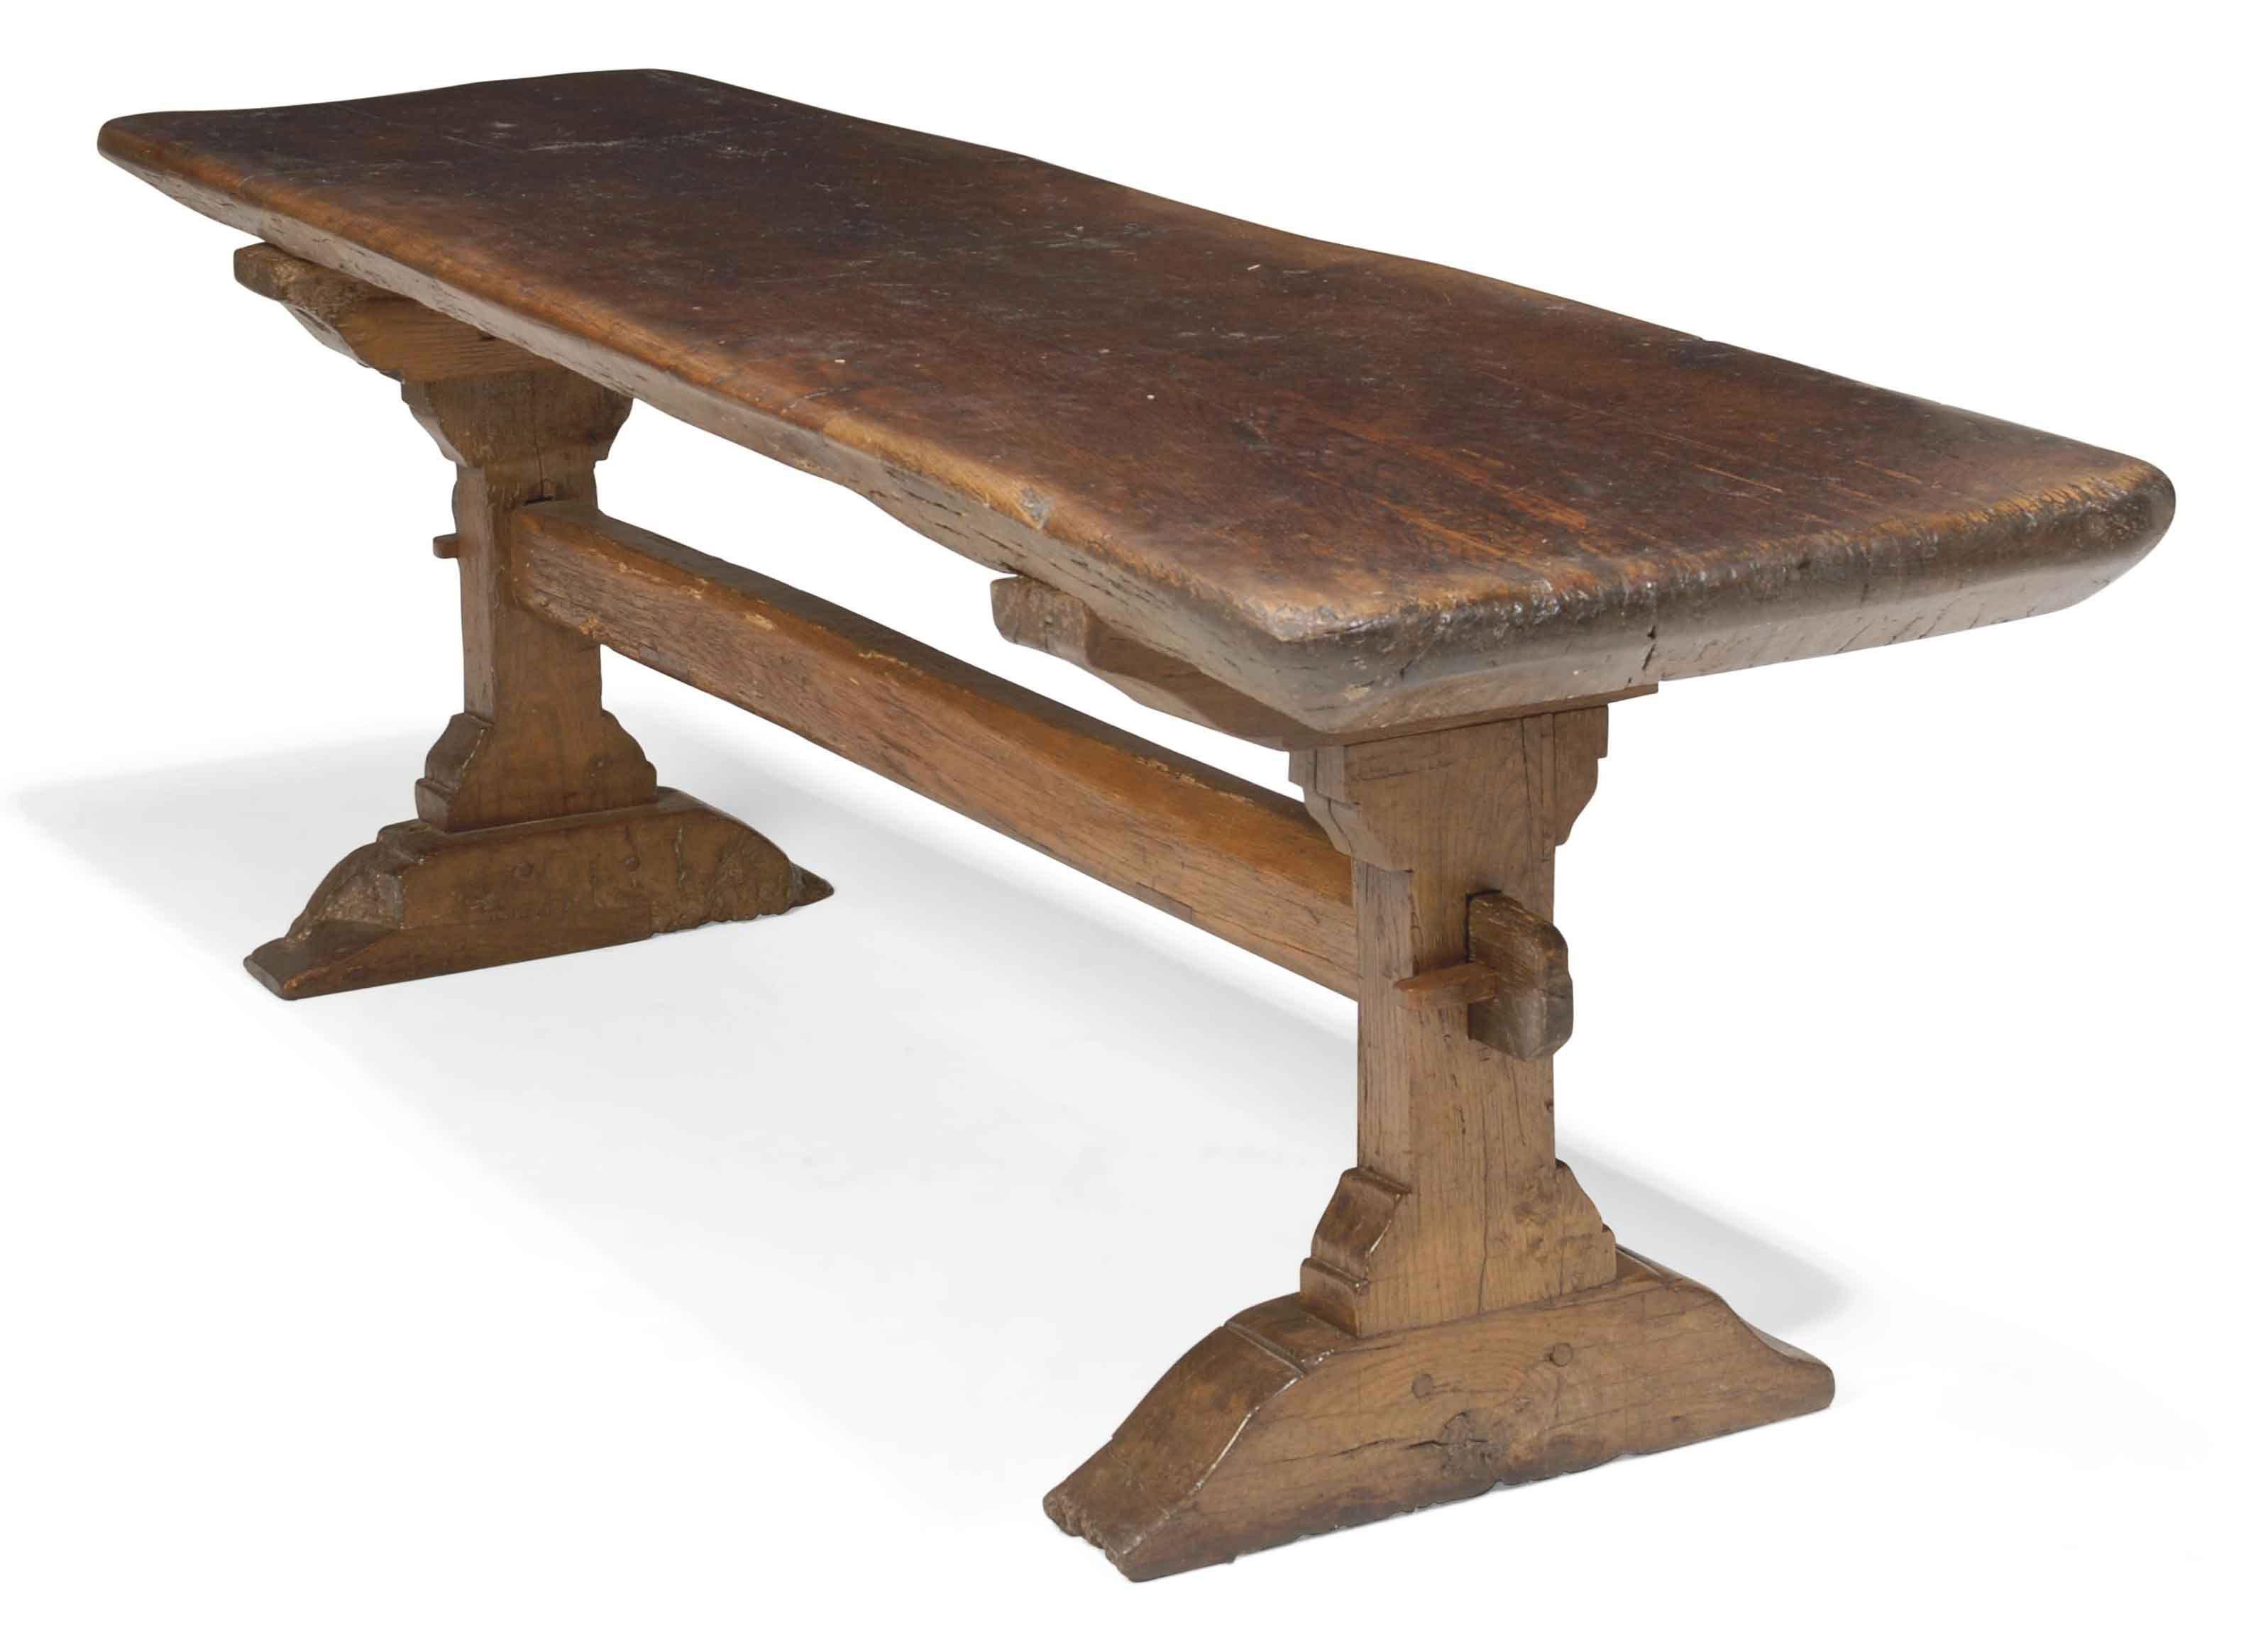 An Elizabethan Oak Trestle Table Late 16th Century Trestle Table Furniture Lighting Christie S Trestle Table Medieval Furniture Table